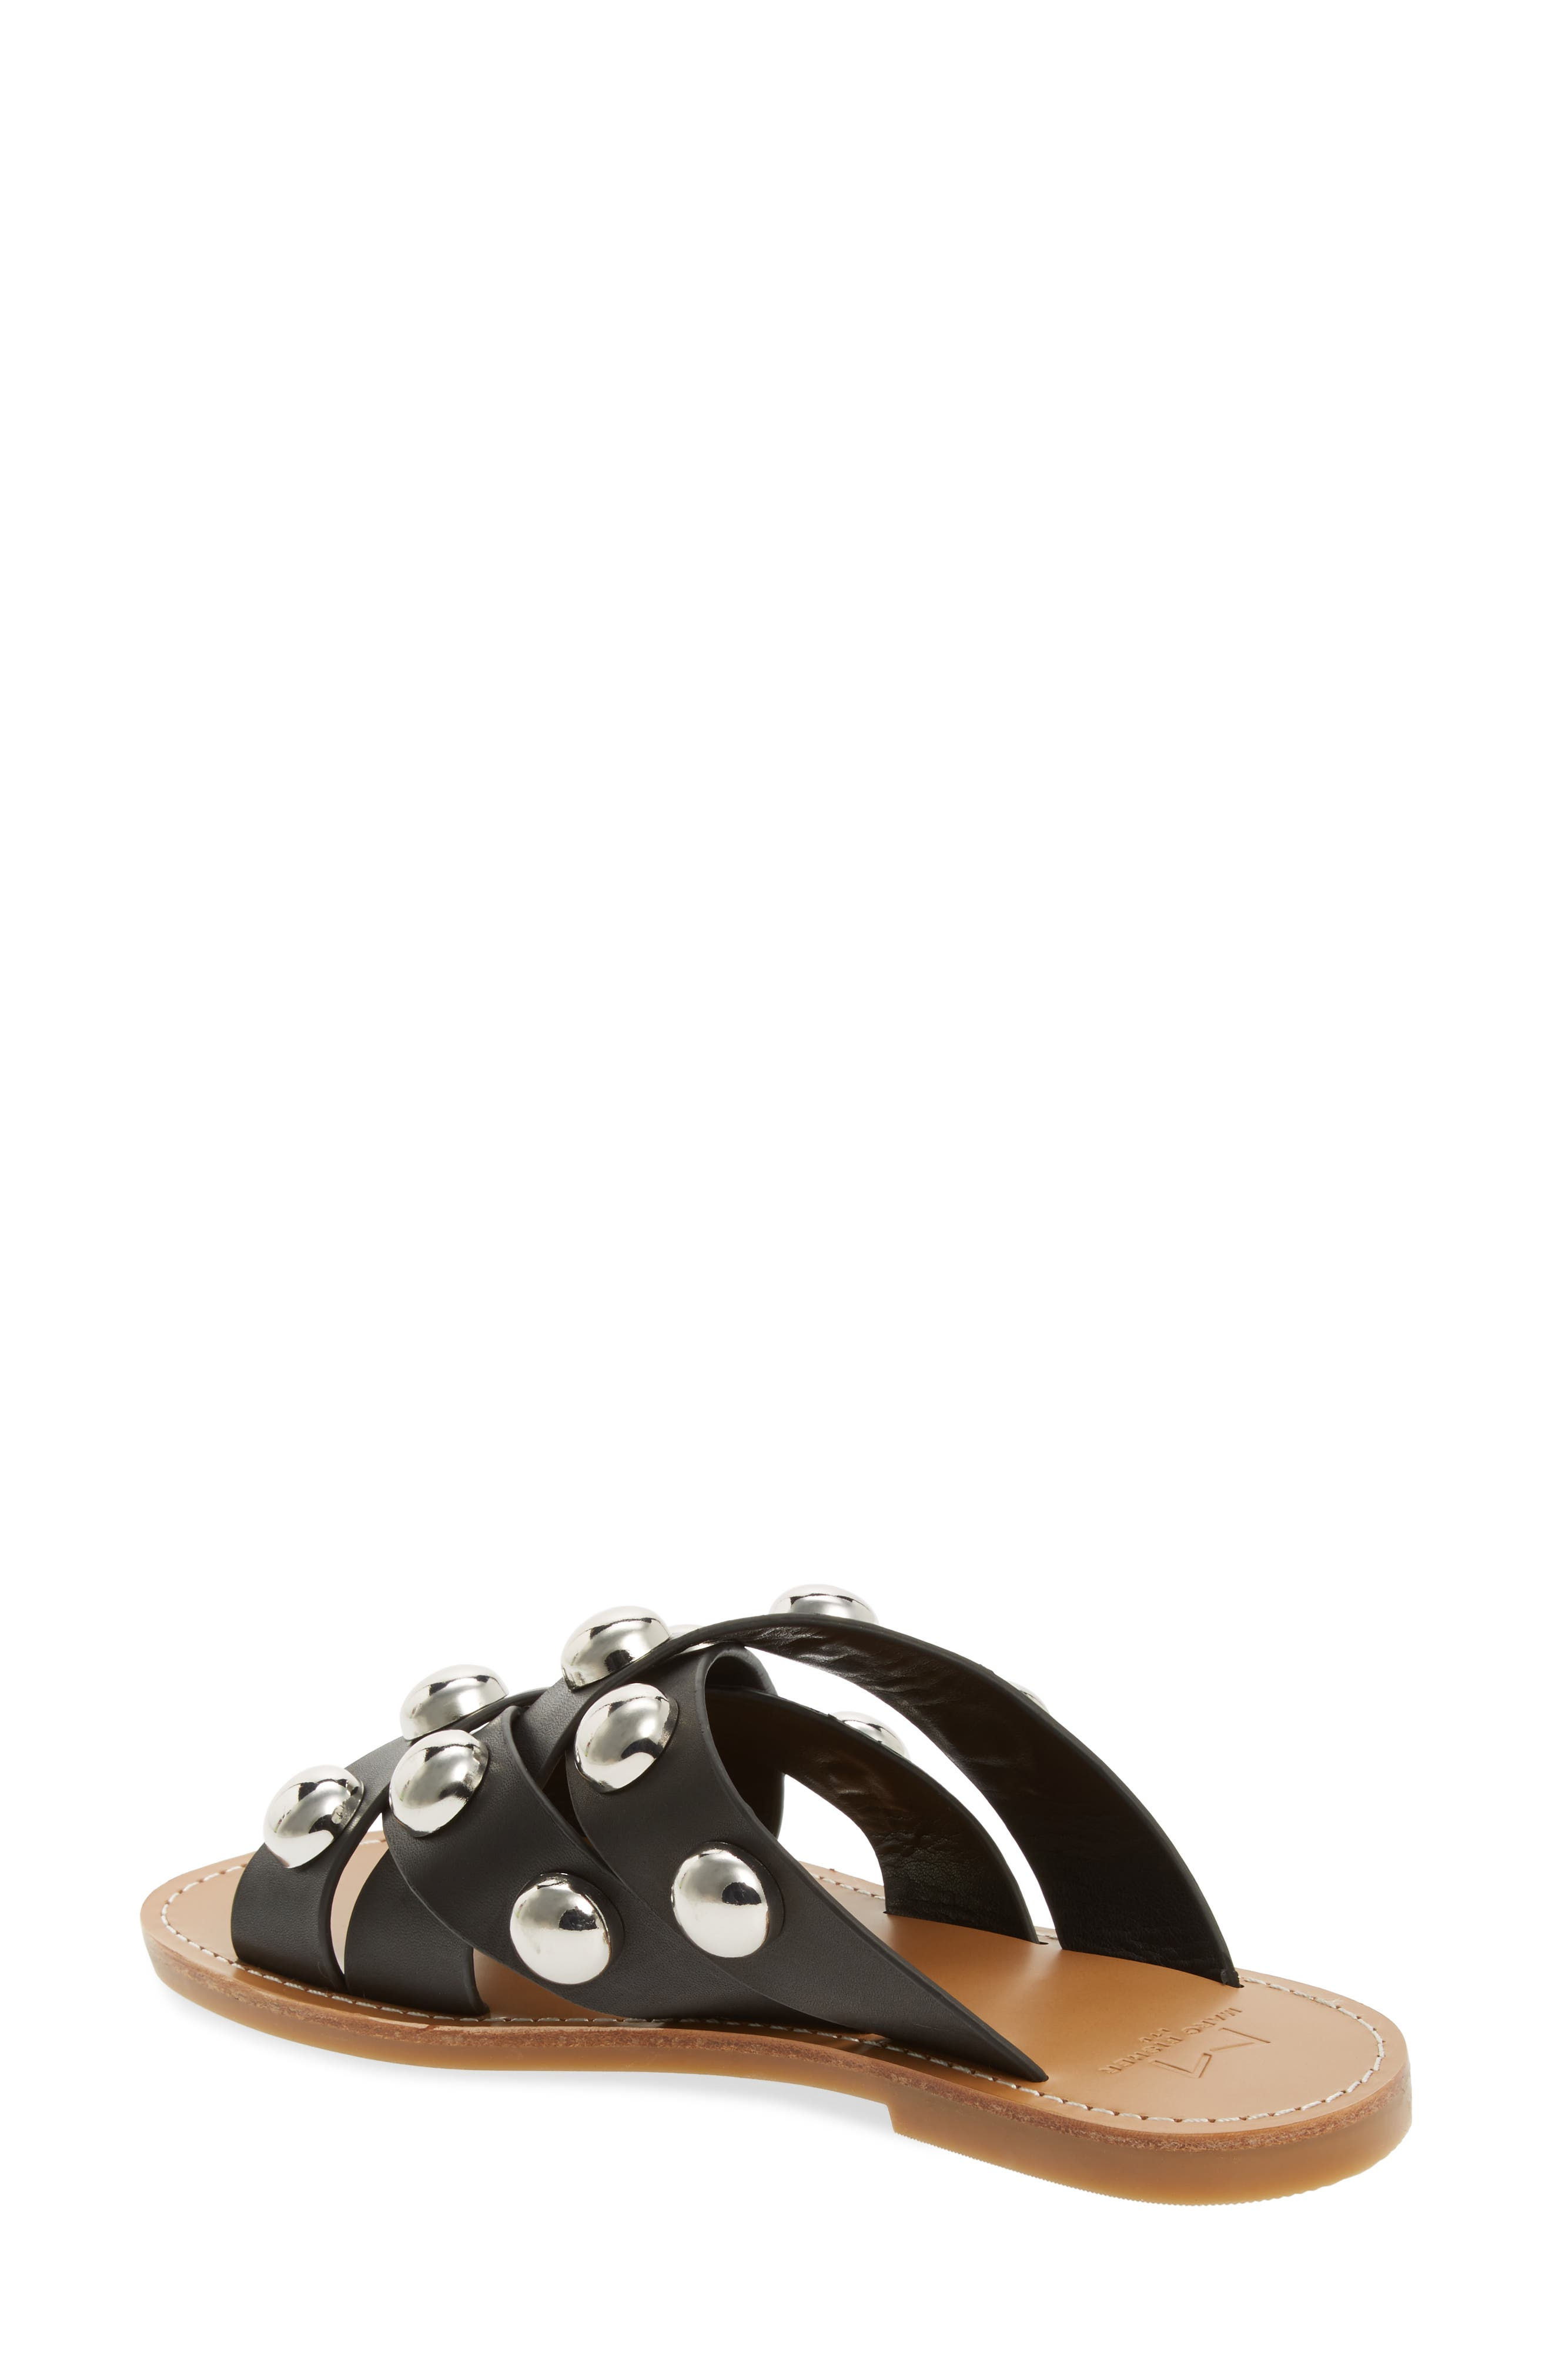 MARC FISHER LTD,                             Raidan Studded Sandal,                             Alternate thumbnail 2, color,                             001